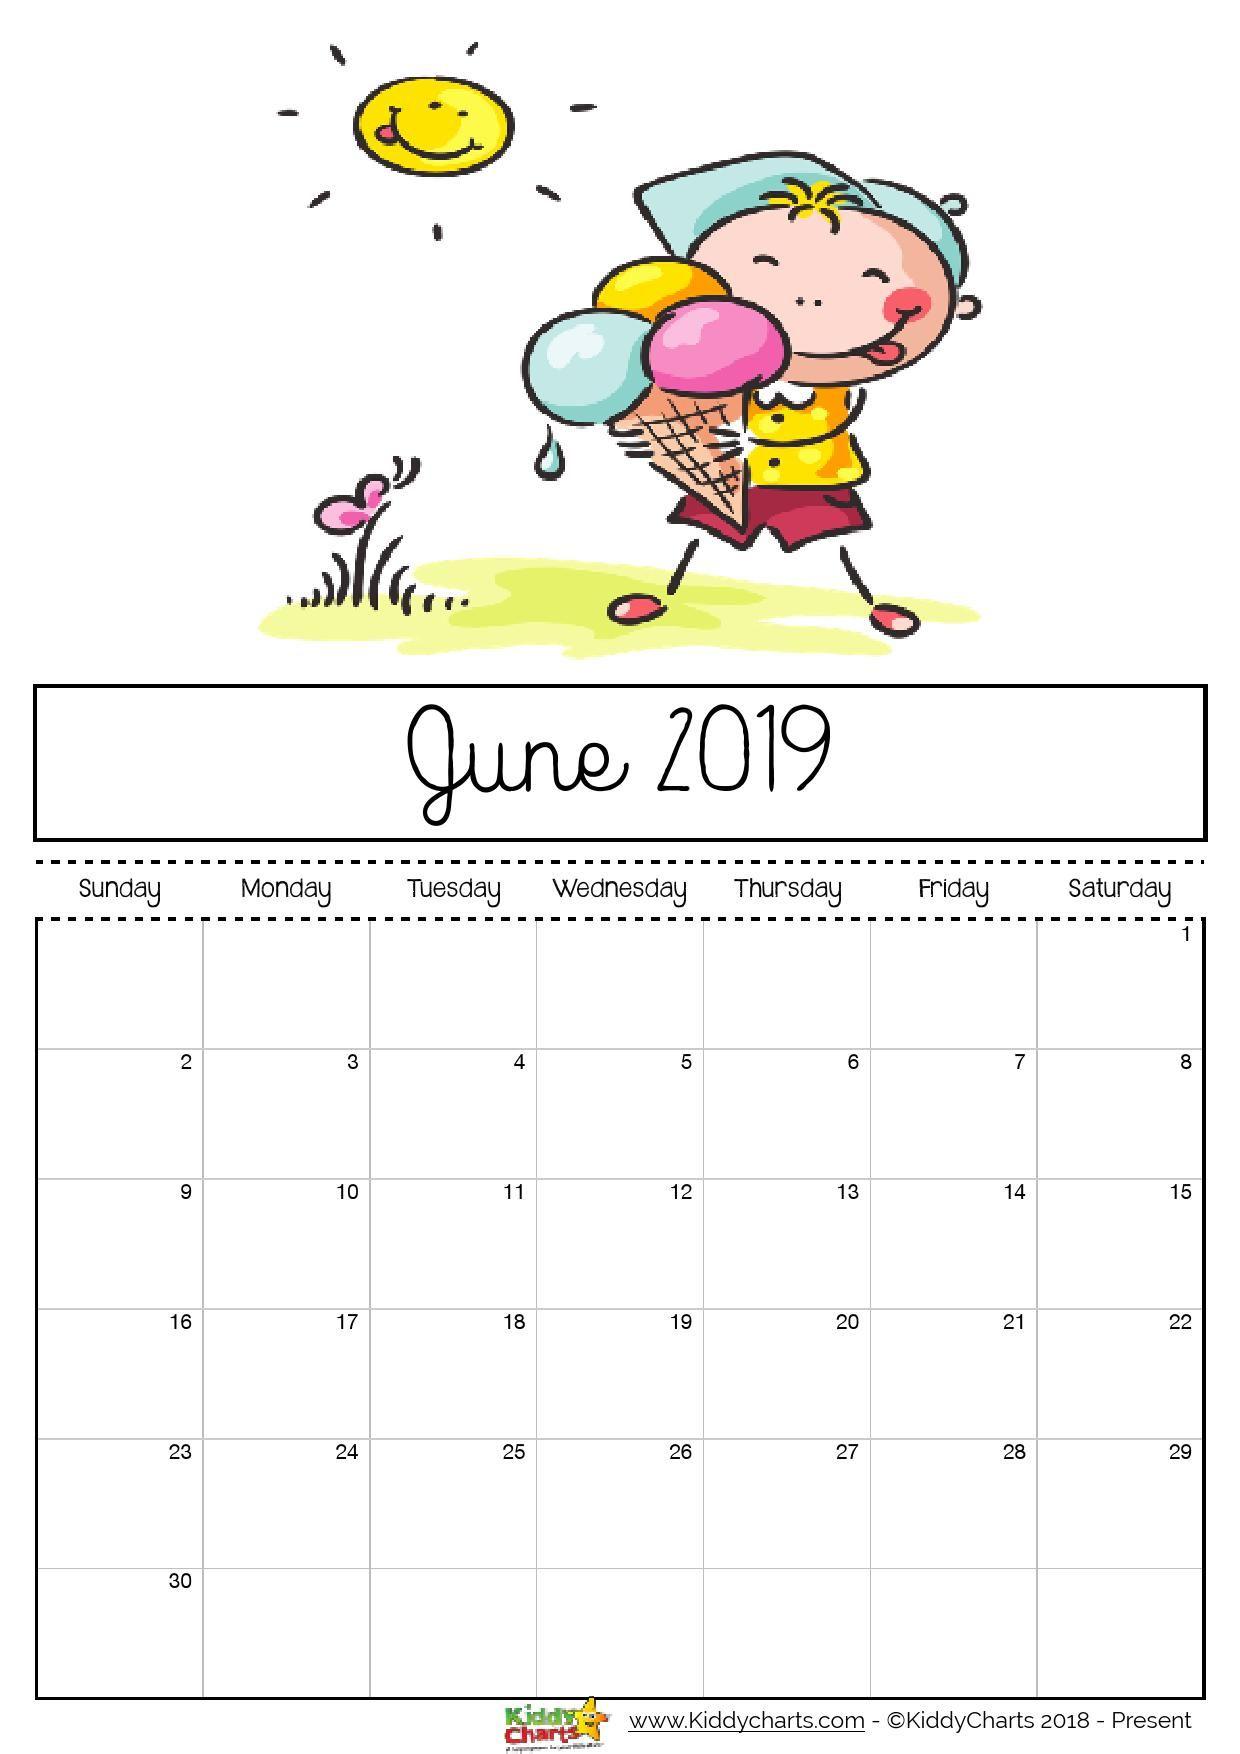 Free Printable 2019 Calendar - Print Yours Here | Home | Kids Calendar, June 2019 Calendar